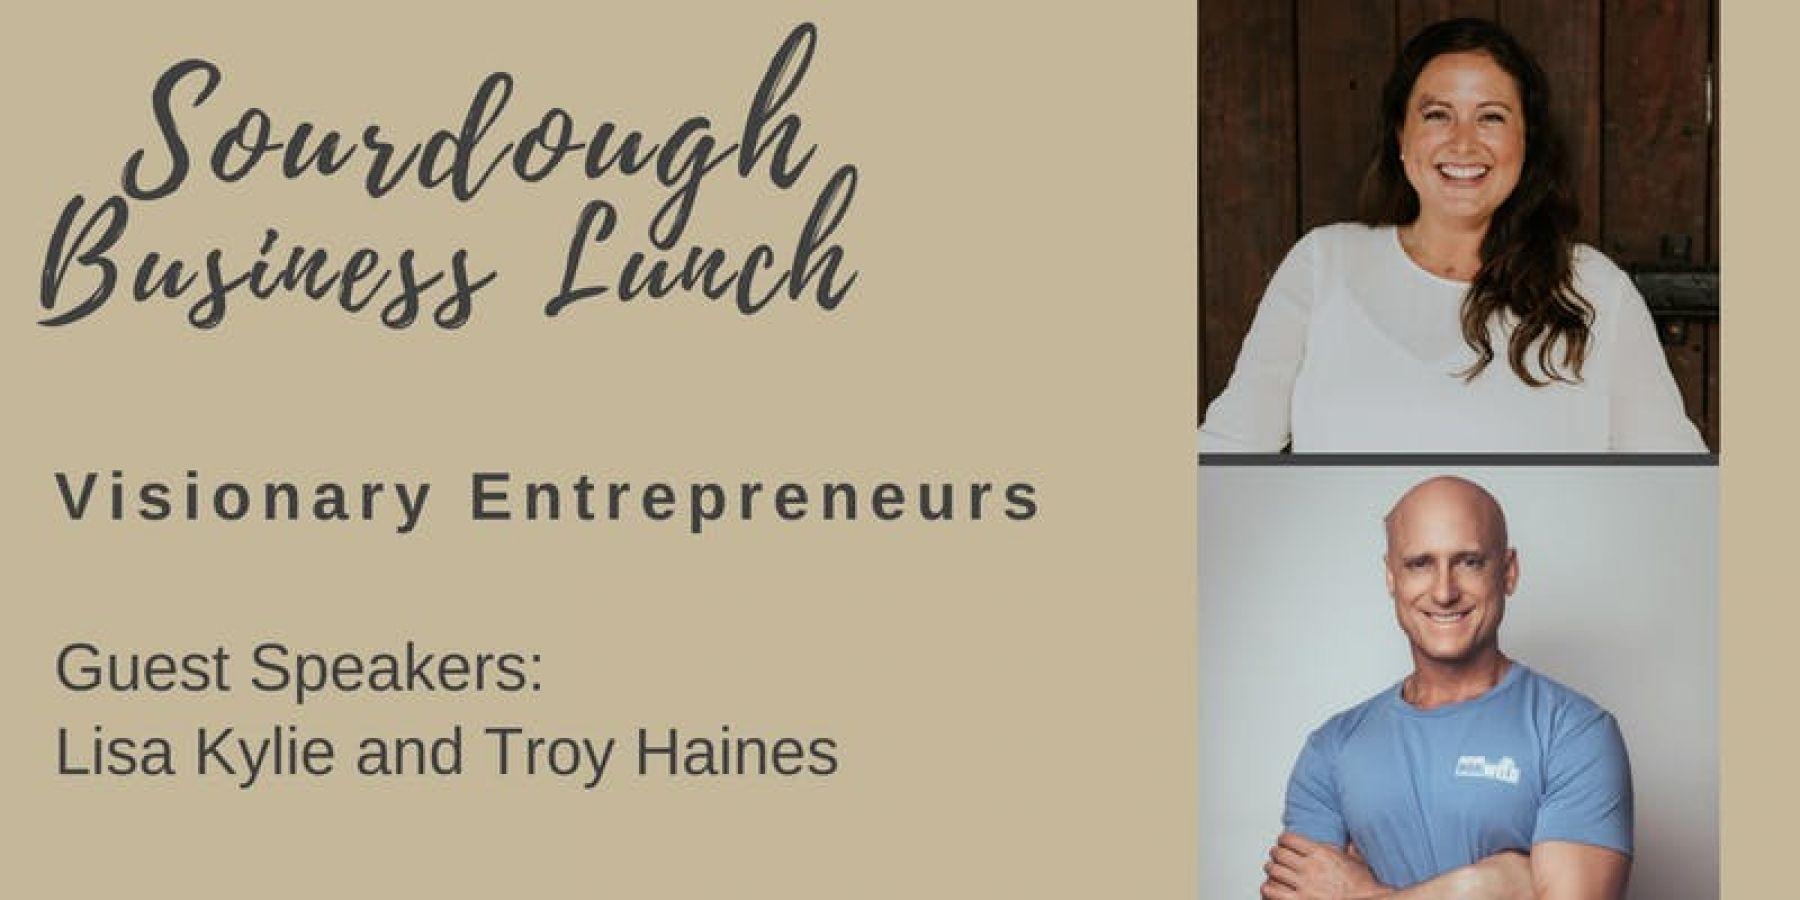 Sourdough Business Lunch - Speaker Series